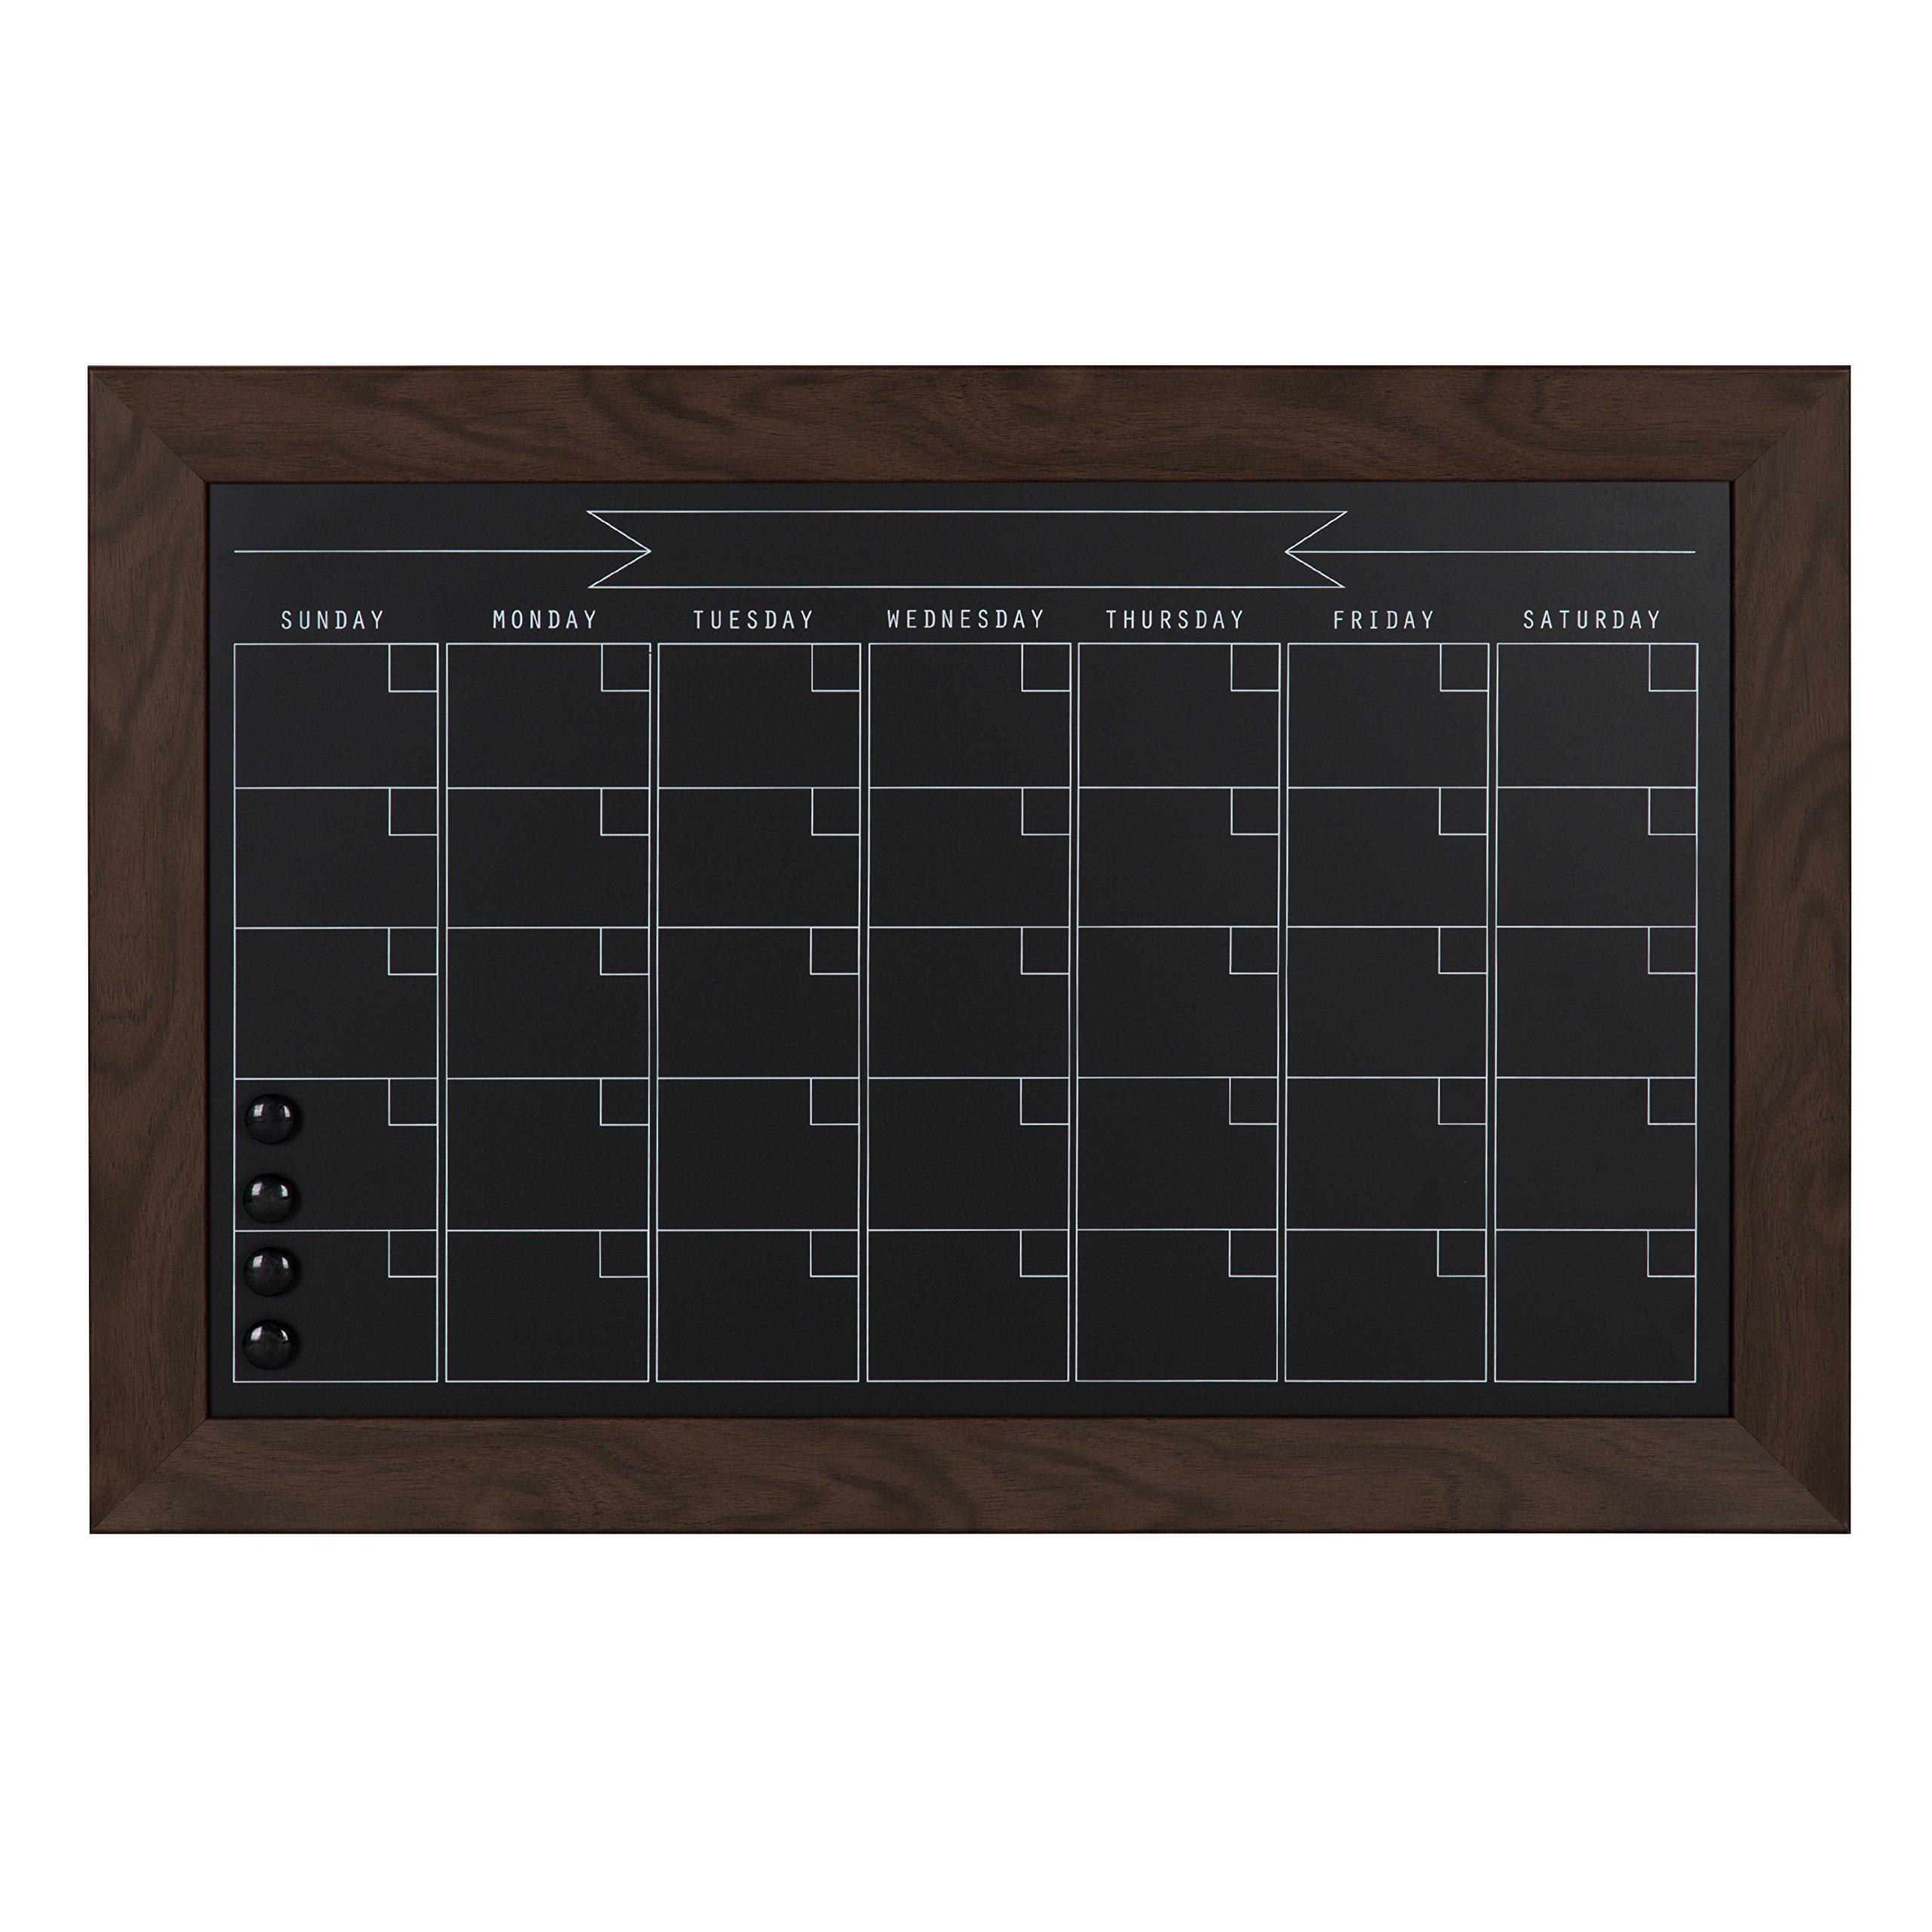 DesignOvation Beatrice Framed Magnetic Chalkboard Monthly Calendar, 18x27, Walnut Brown by DesignOvation